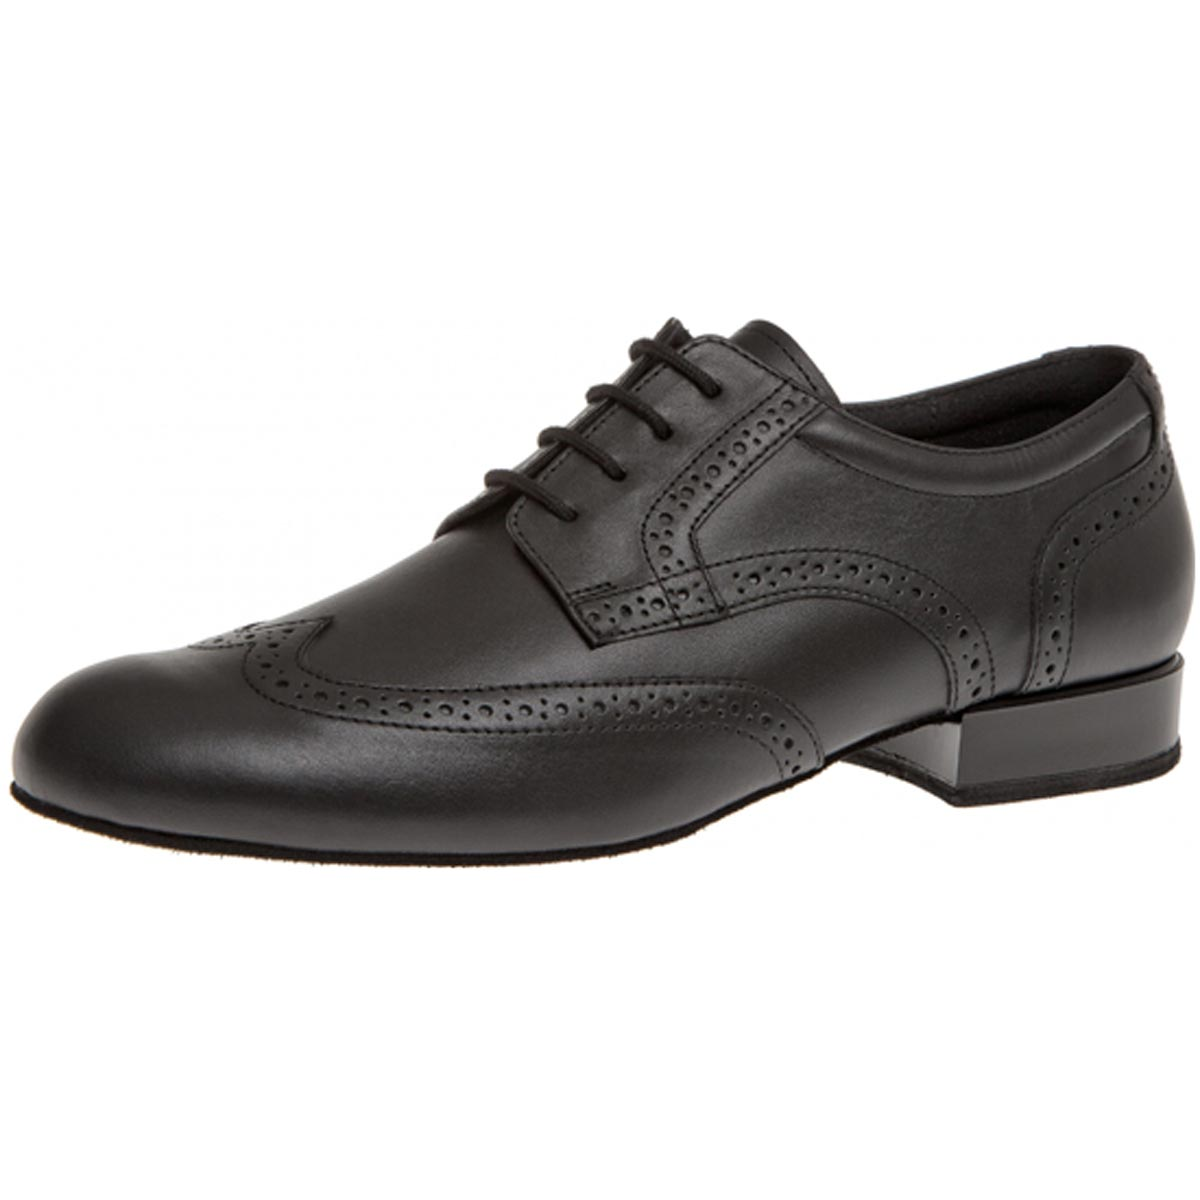 Zapatos Negro 025 Hombres ancho 028 De Diamant Cuero Baile 099 qFPWOw